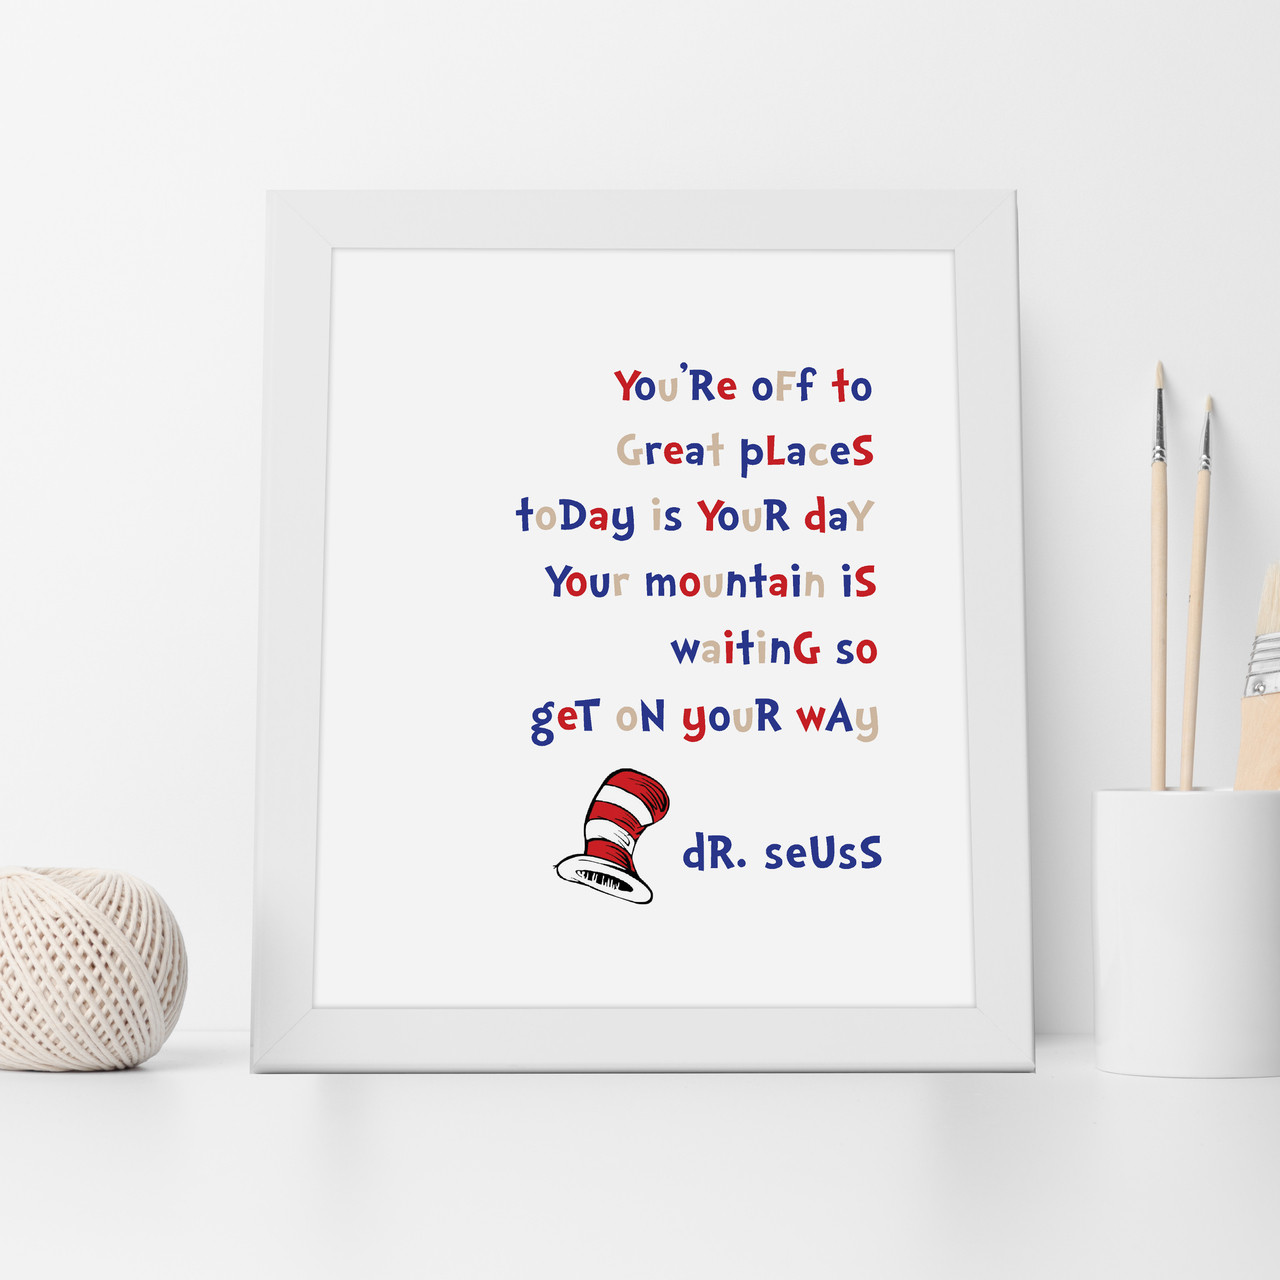 Dr Seuss Mountain Is Waiting Inspirational Wall Art Print